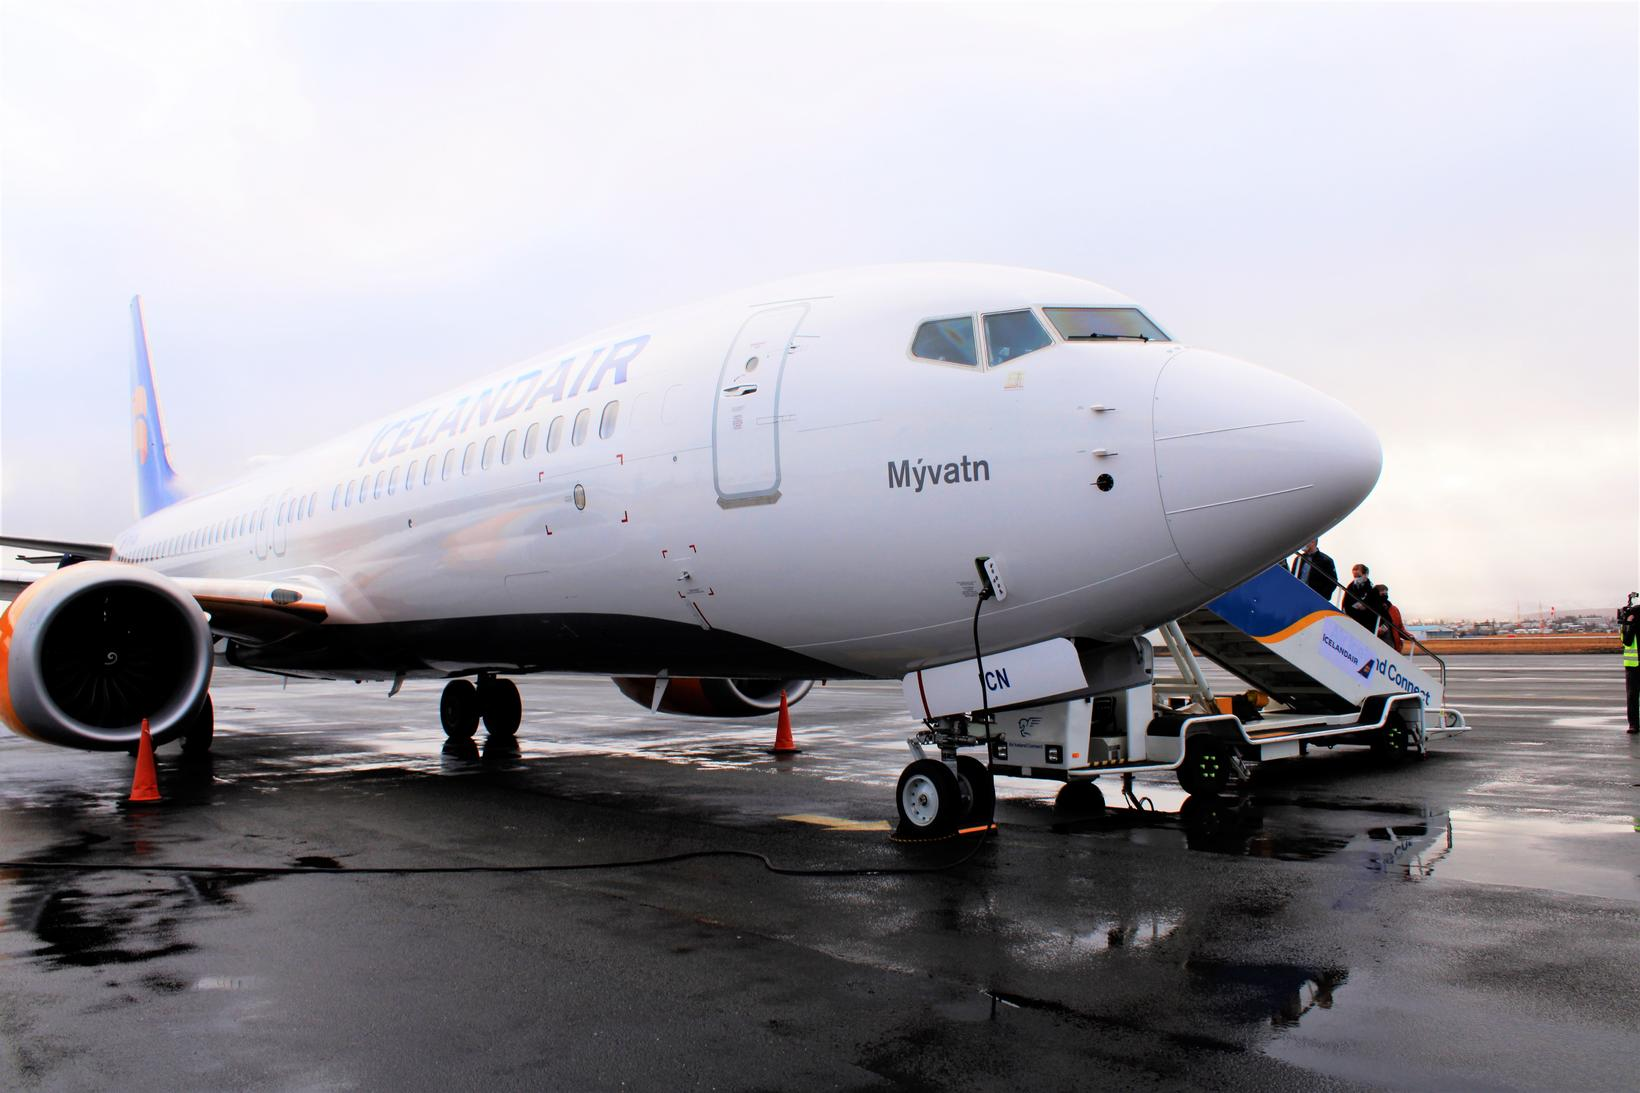 Boeing 737 MAX at Reykjavík Airport.